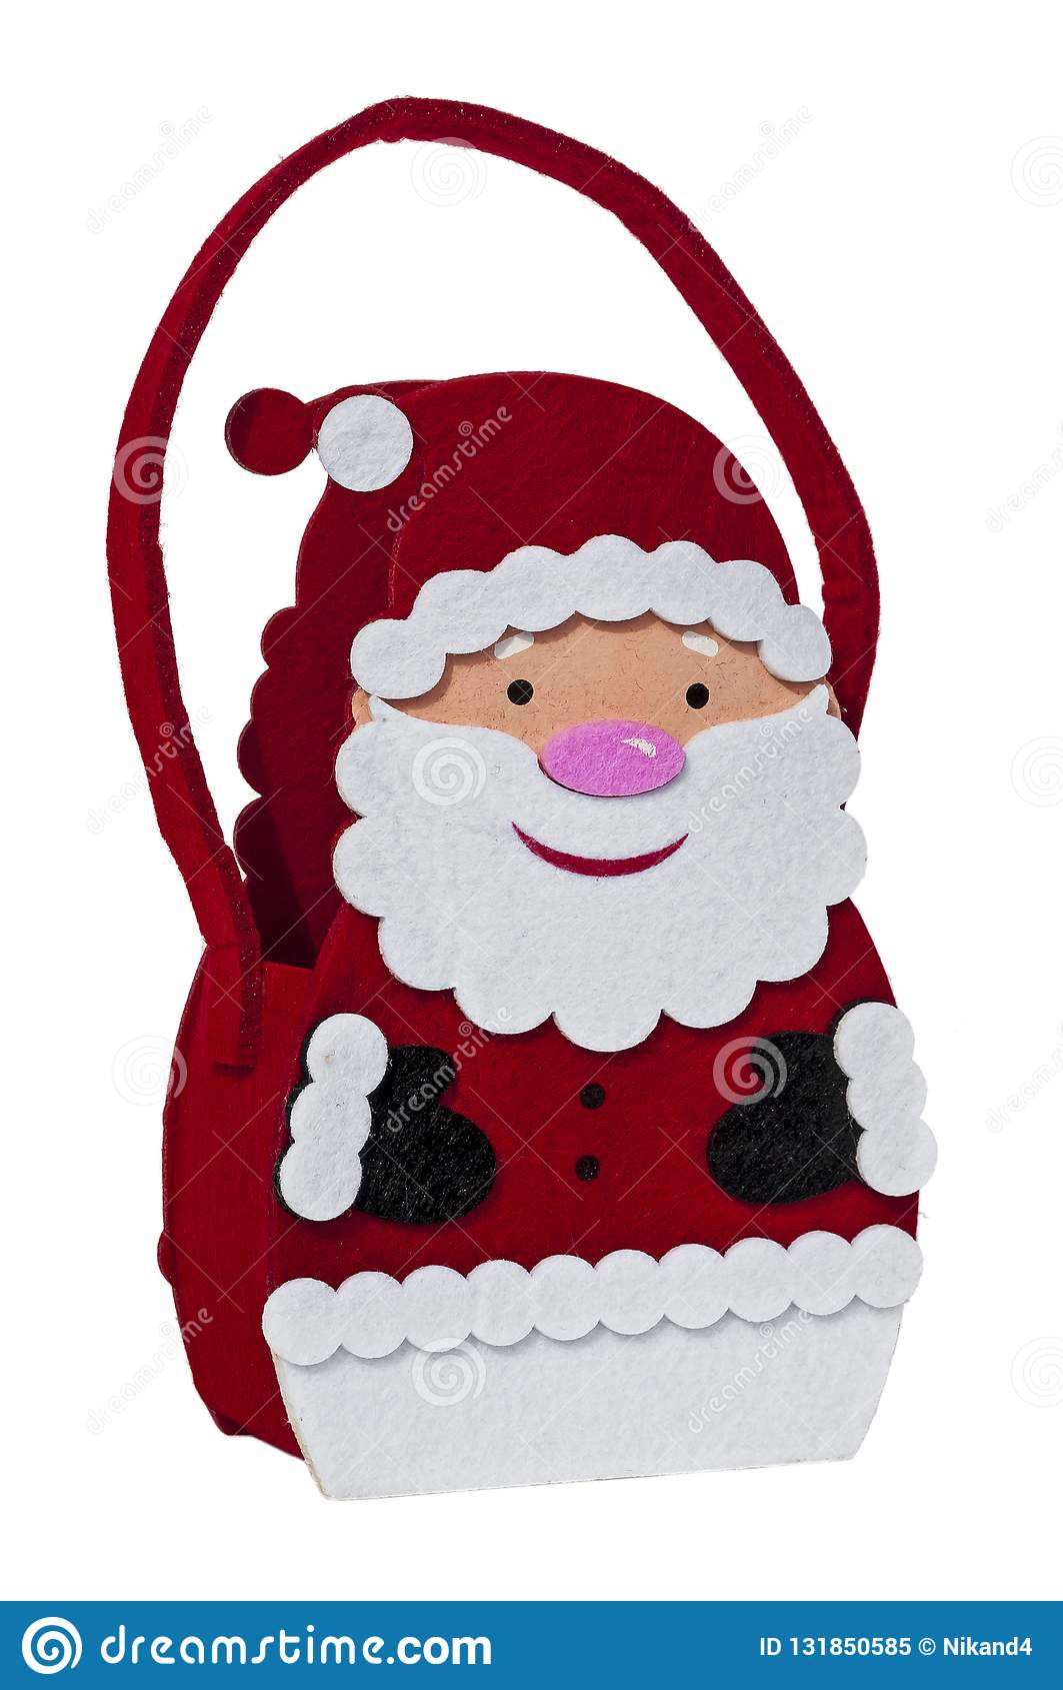 Felt Fabric Santa Claus Christmas Wine Bottle Gift Bag Stock ...